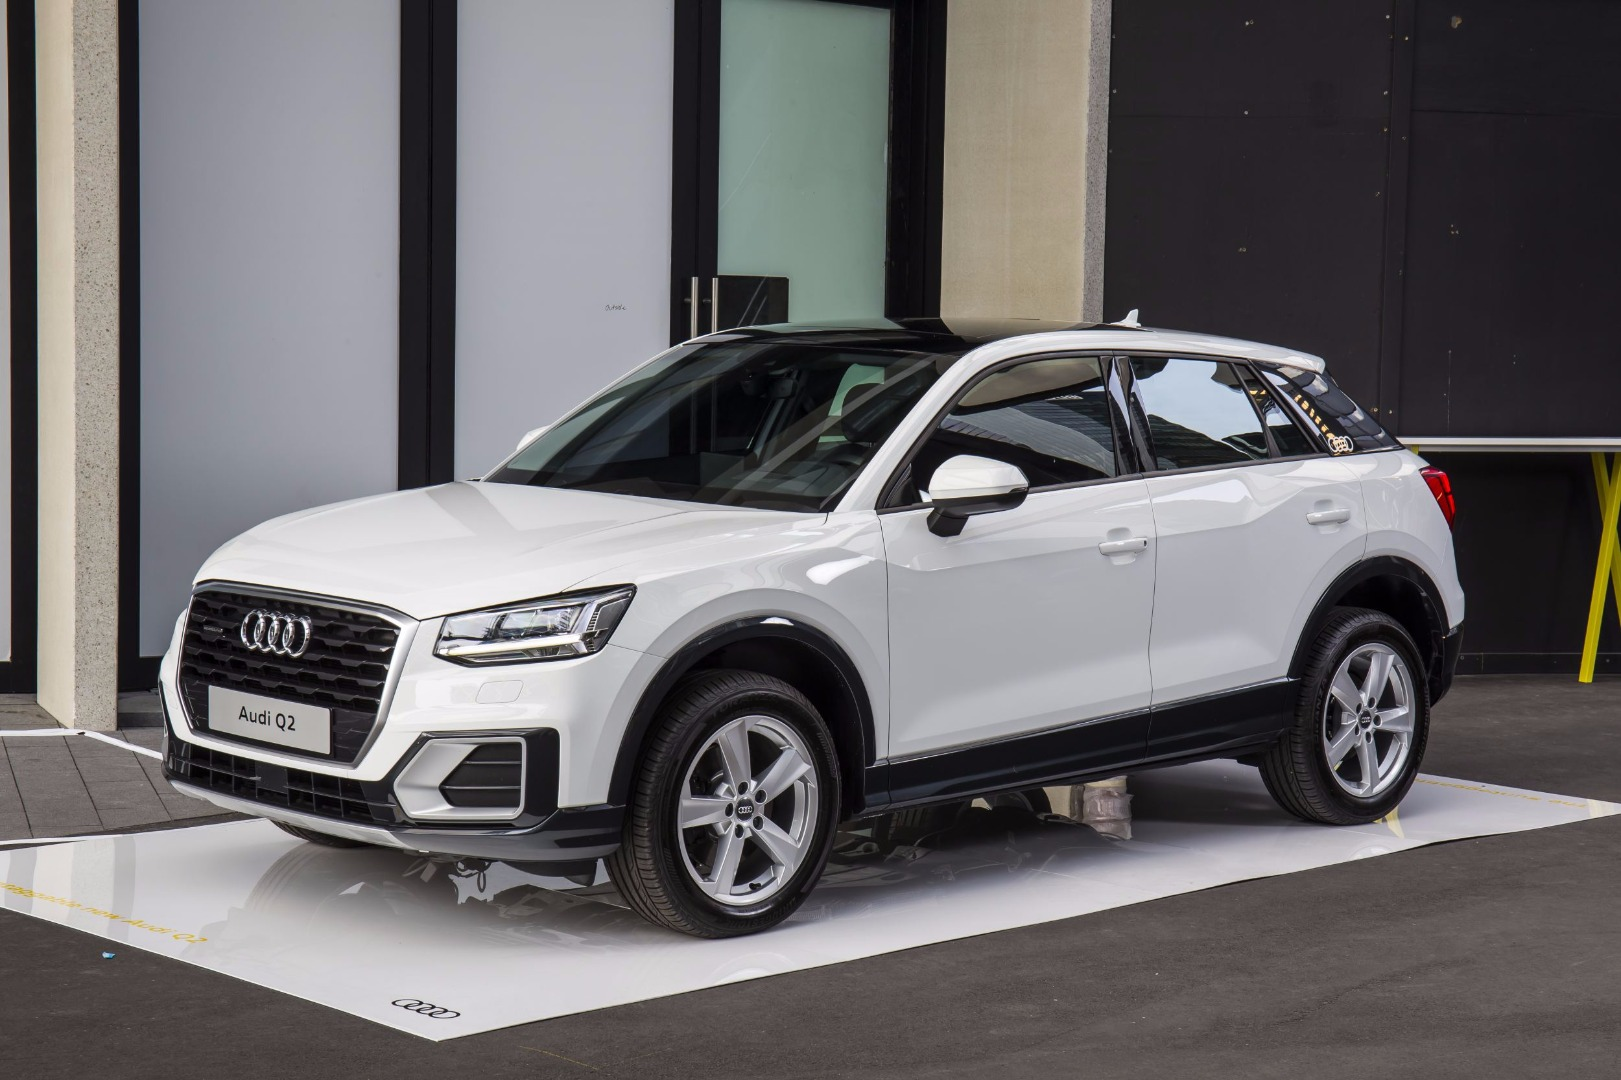 News Audi Australia Says All New Q2 Arrives In February 2017